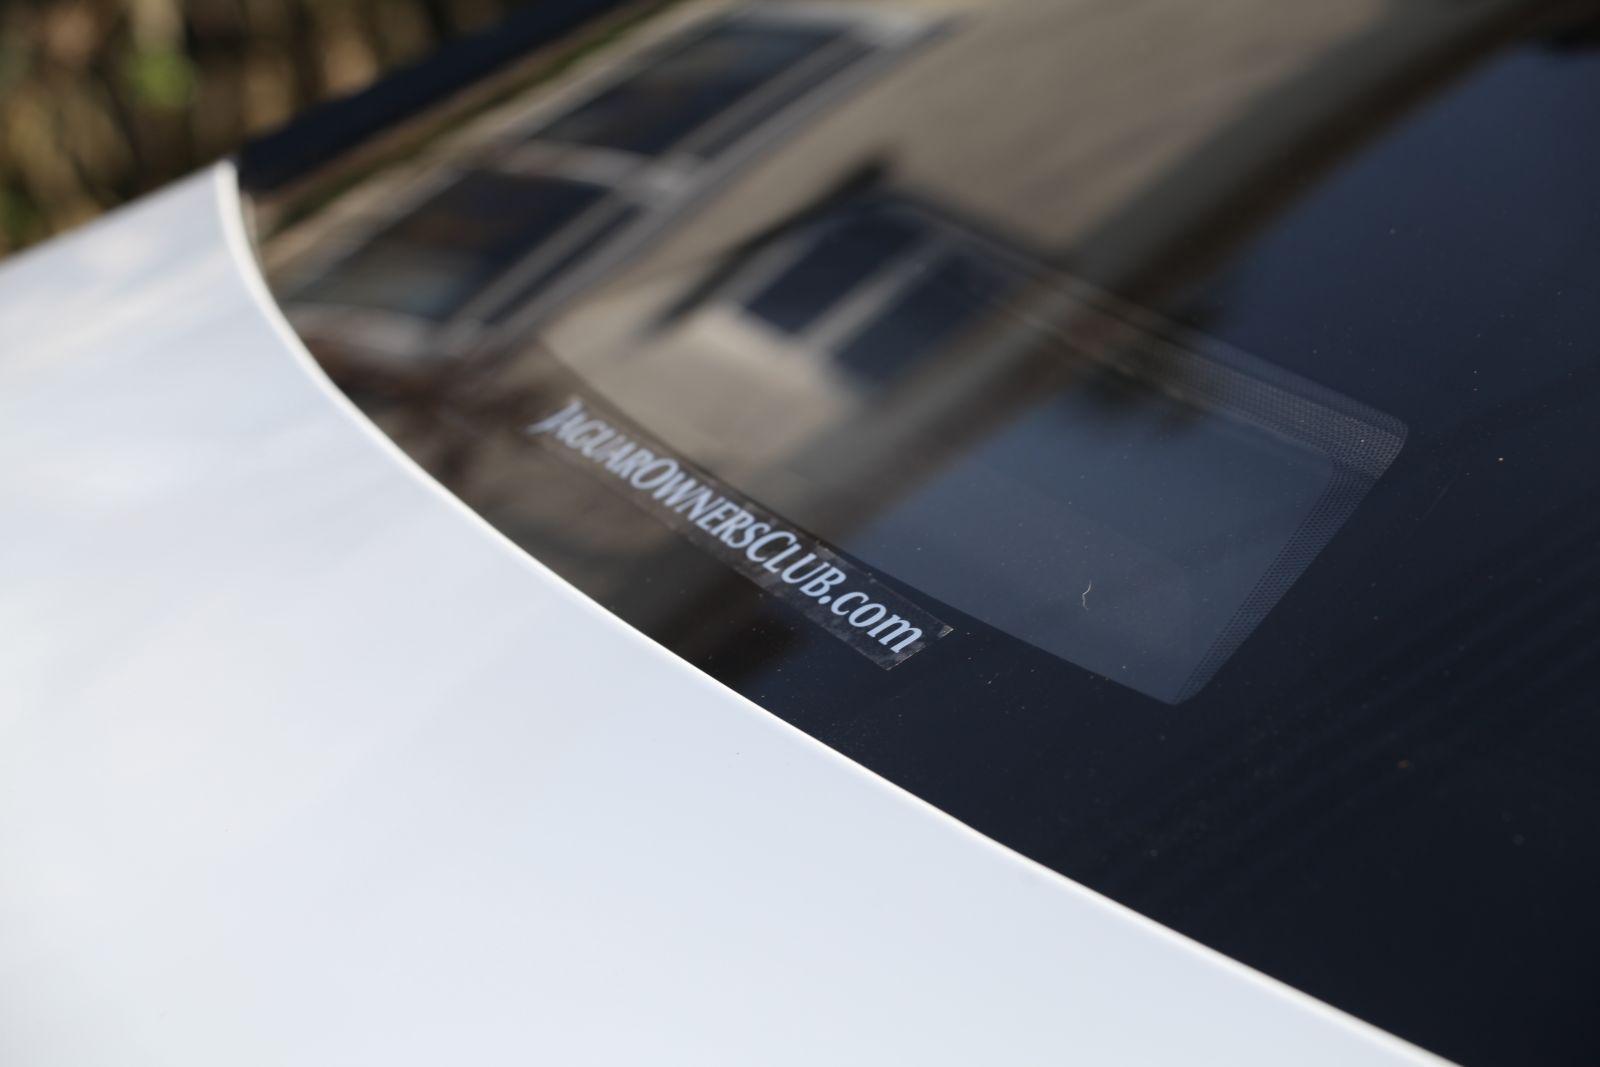 Jaguar XJ Supersport Owner's club sticker